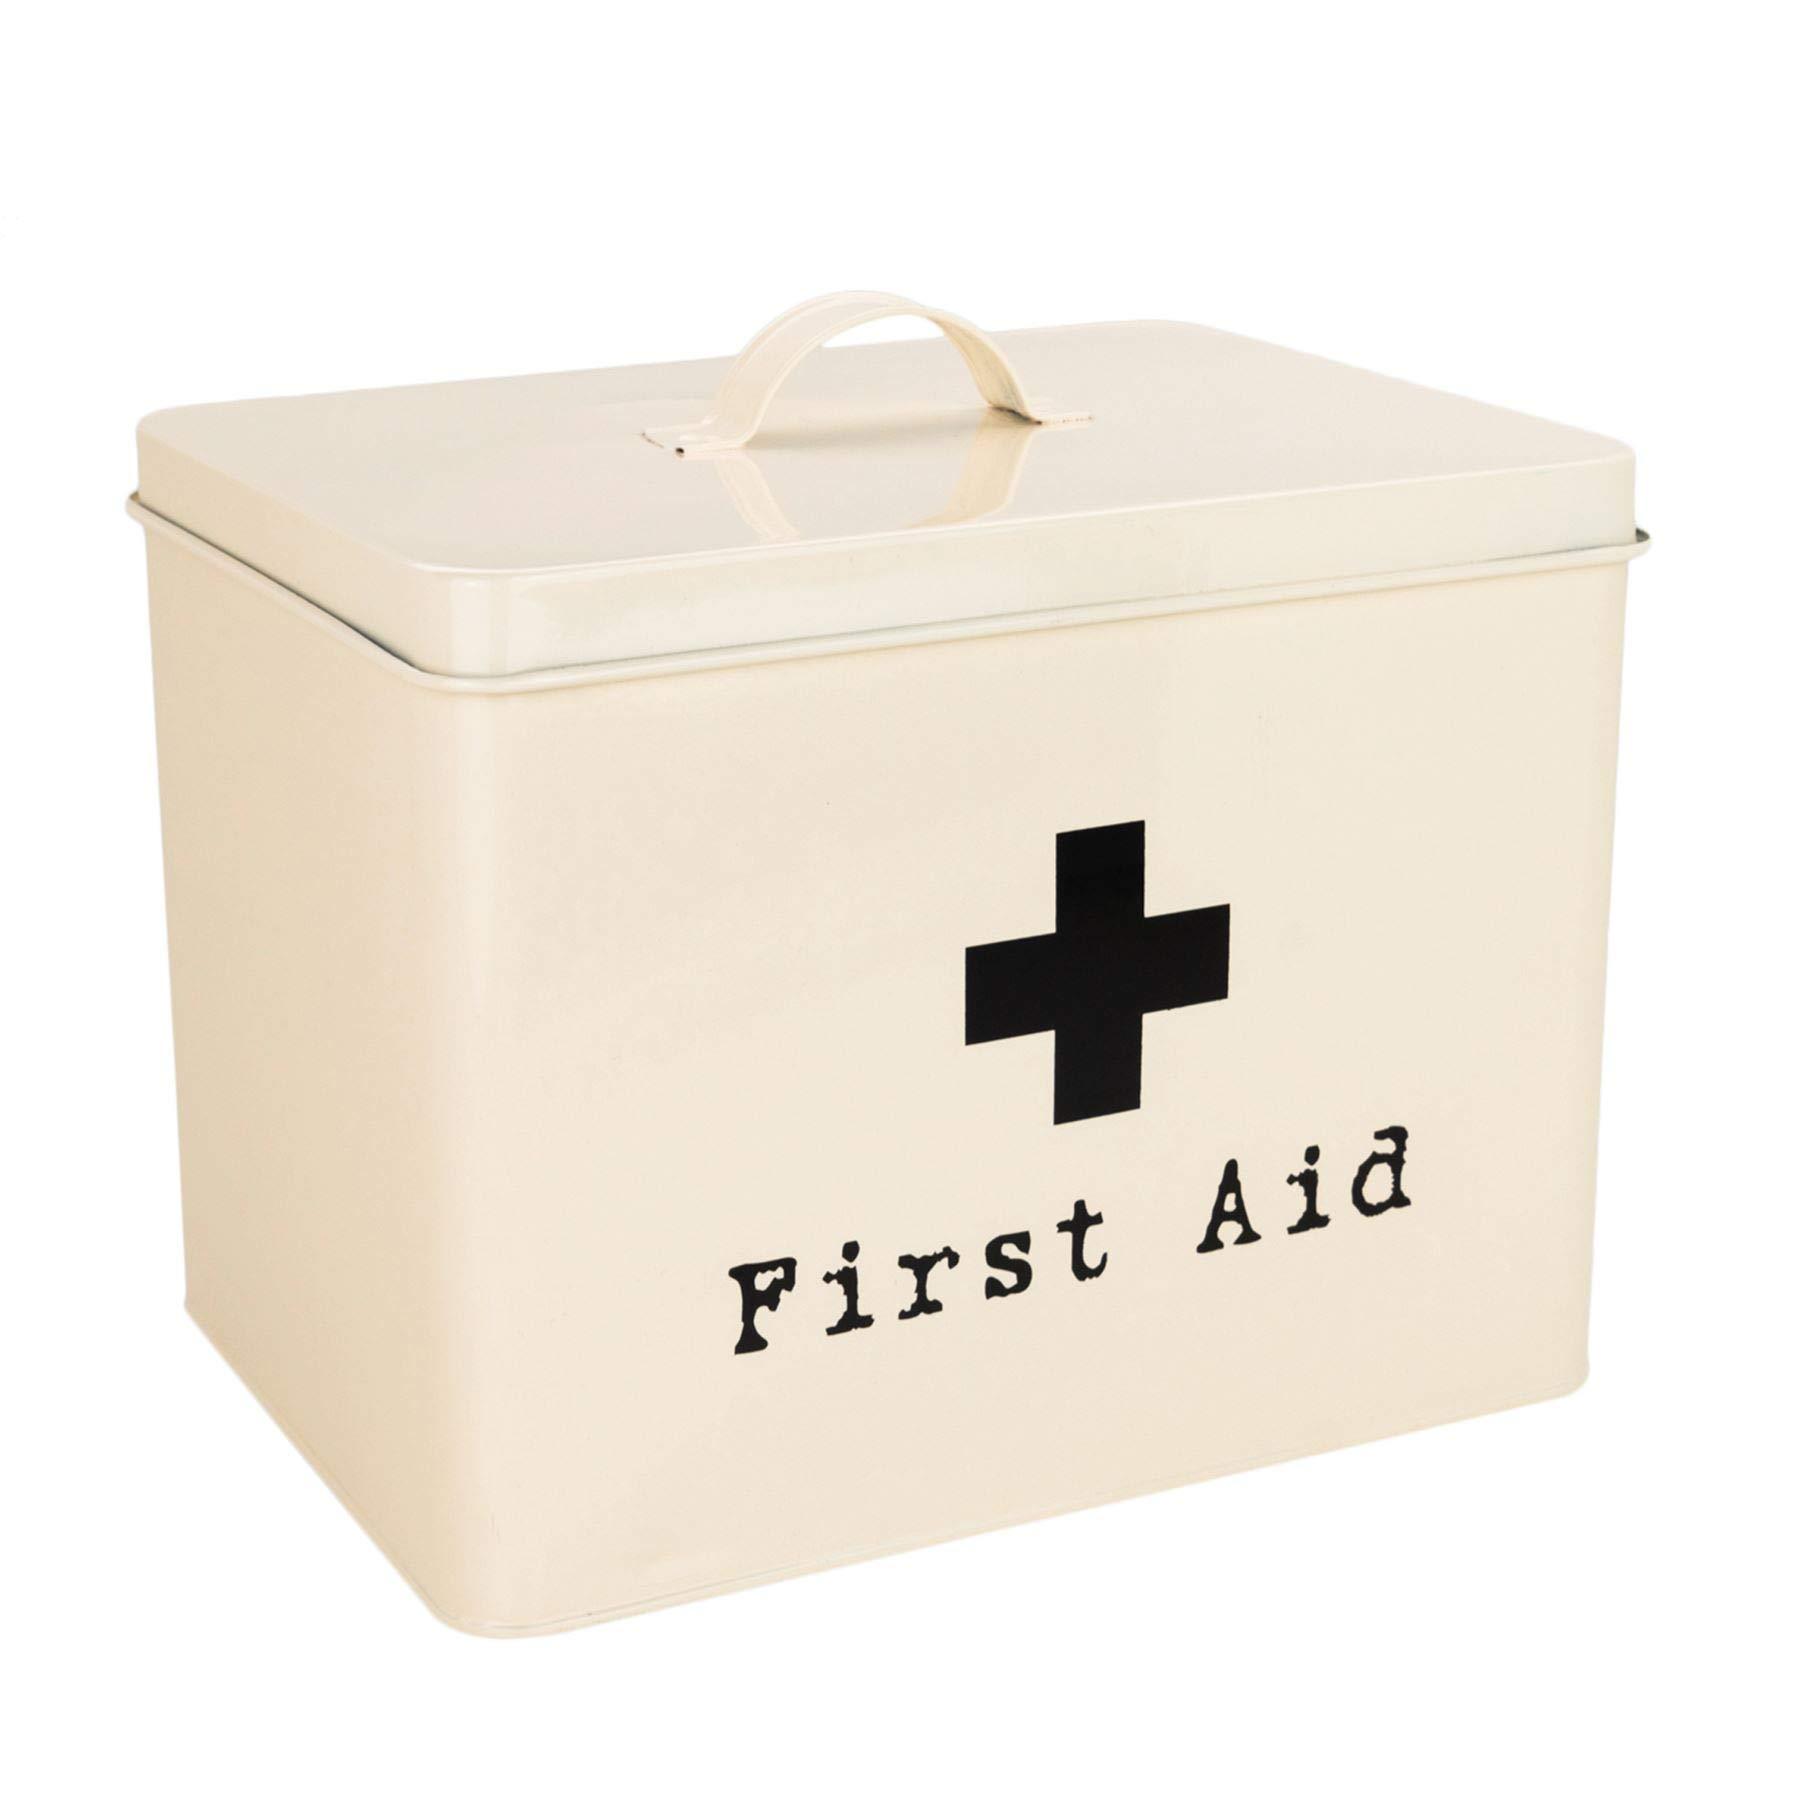 Harbour Housewares First Aid Medicine Storage Box in Vintage Metal - Cream by Harbour Housewares